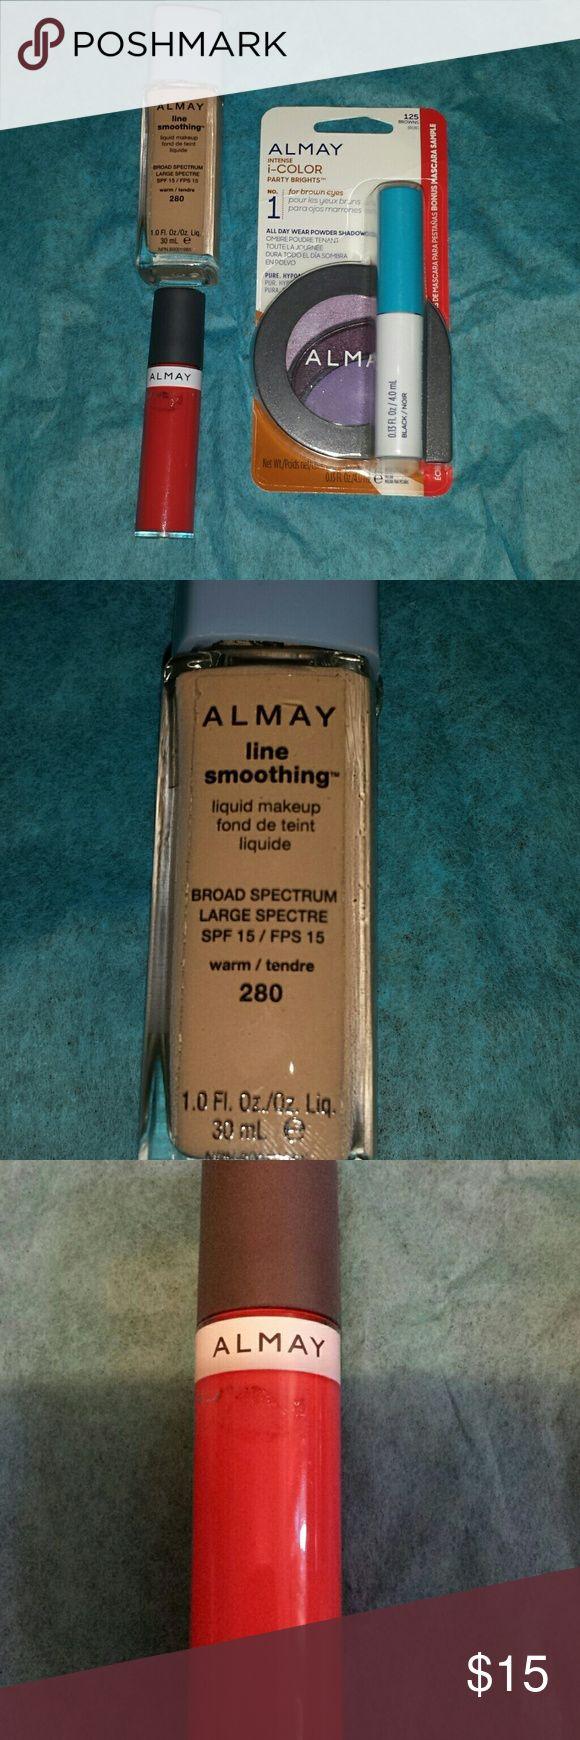 NEW Almay makeup bundle Brands new never opened Almay makeup.  Line smoothing liquid makeup foundation, spf 15, warm 280.... liquid lip balm , apricot 900... and eyeshadow and mascara pack no.1.. almay Makeup